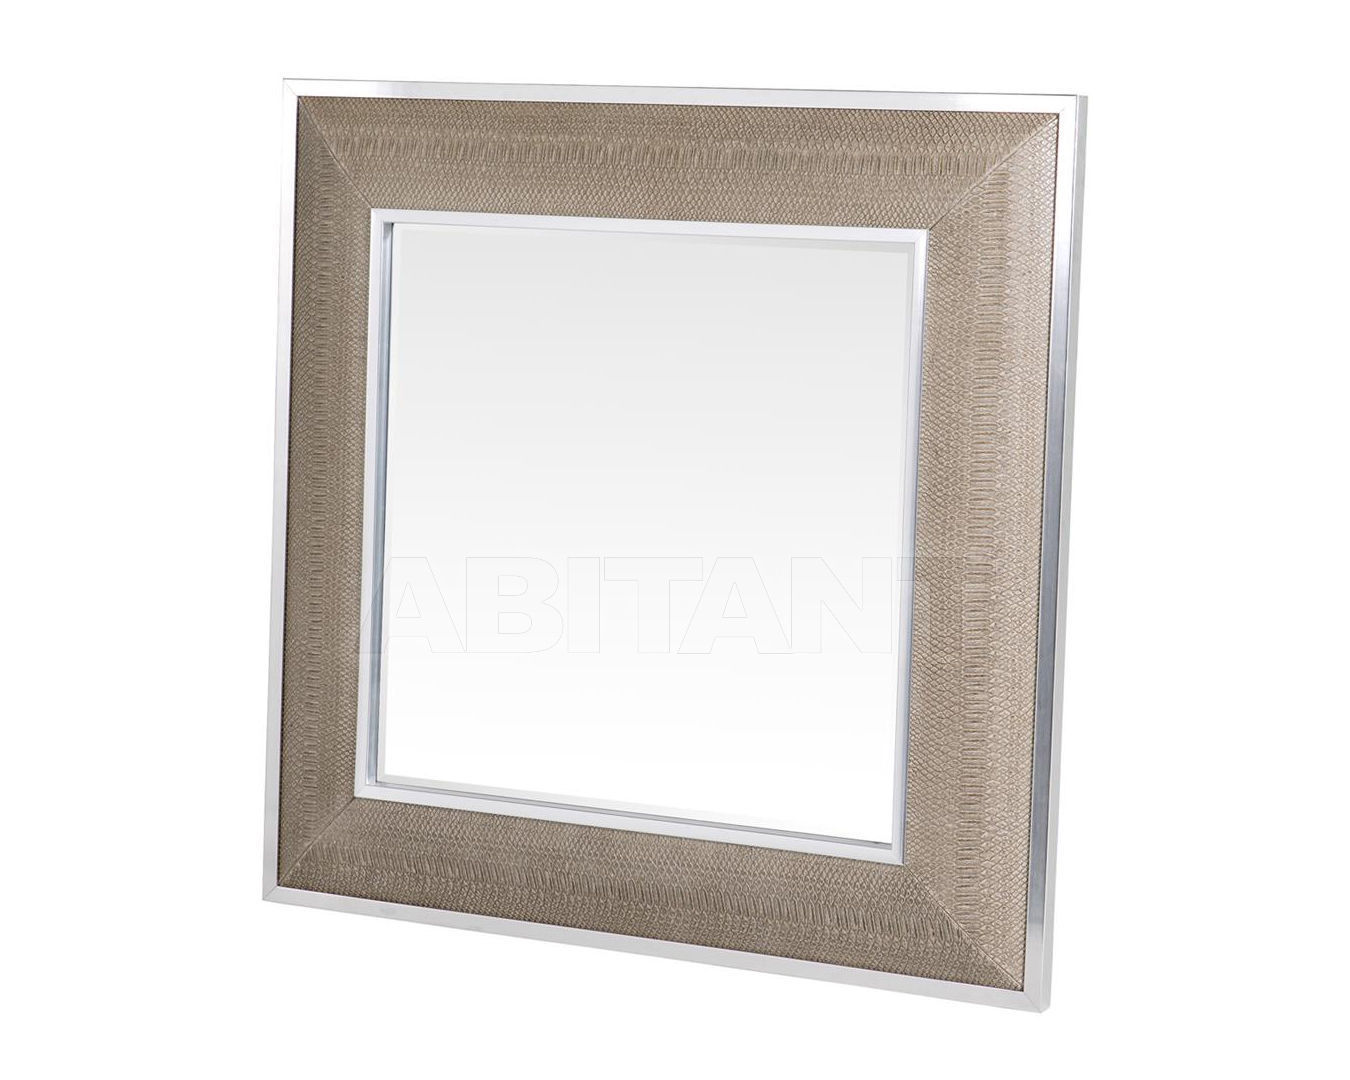 Купить Зеркало настенное Cobra Eichholtz  Mirrors And Prints 105252